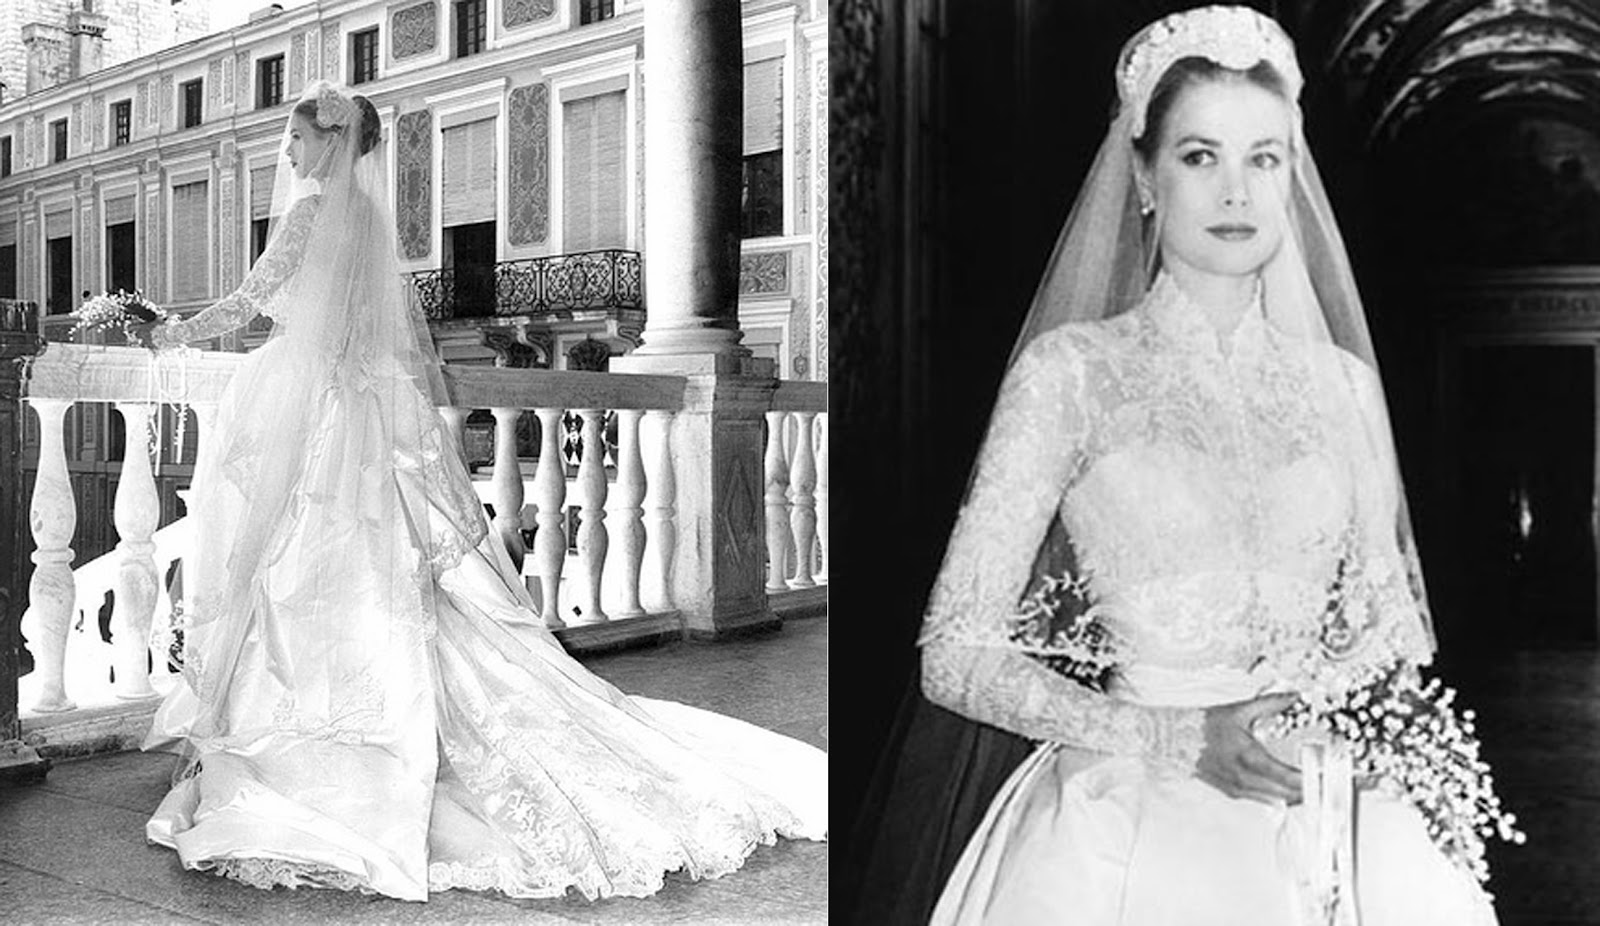 Emejing princess grace wedding gown contemporary styles for Princess grace wedding dress